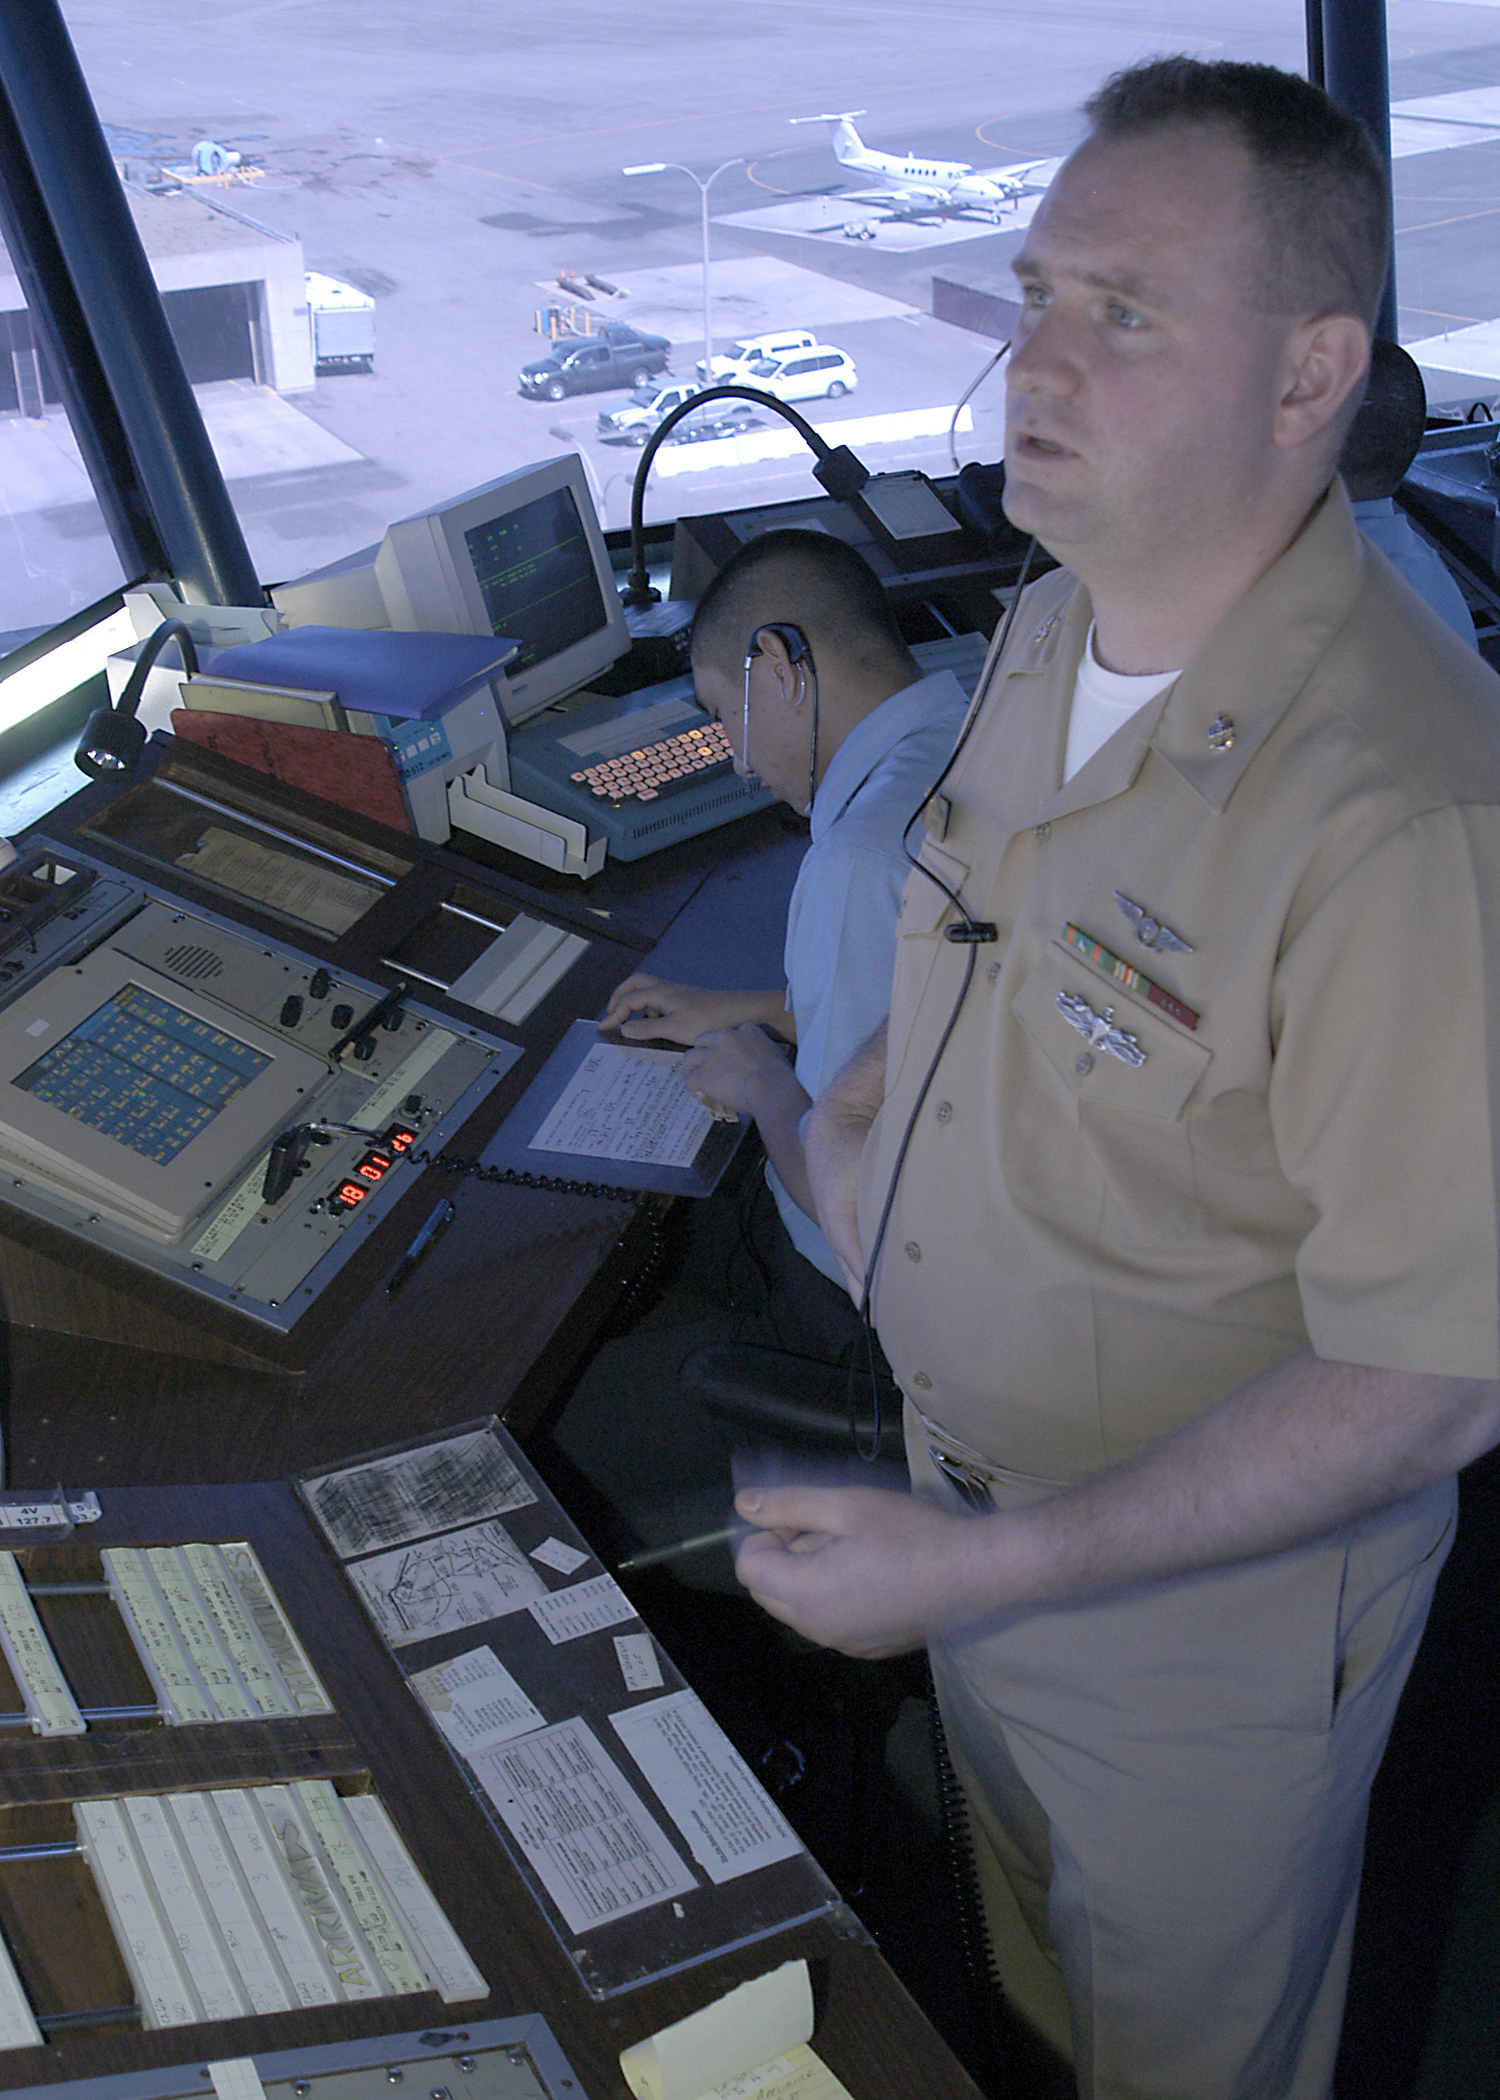 File:US Navy 050405-N-7281D-016 Chief Air Traffic Controller Scott ...